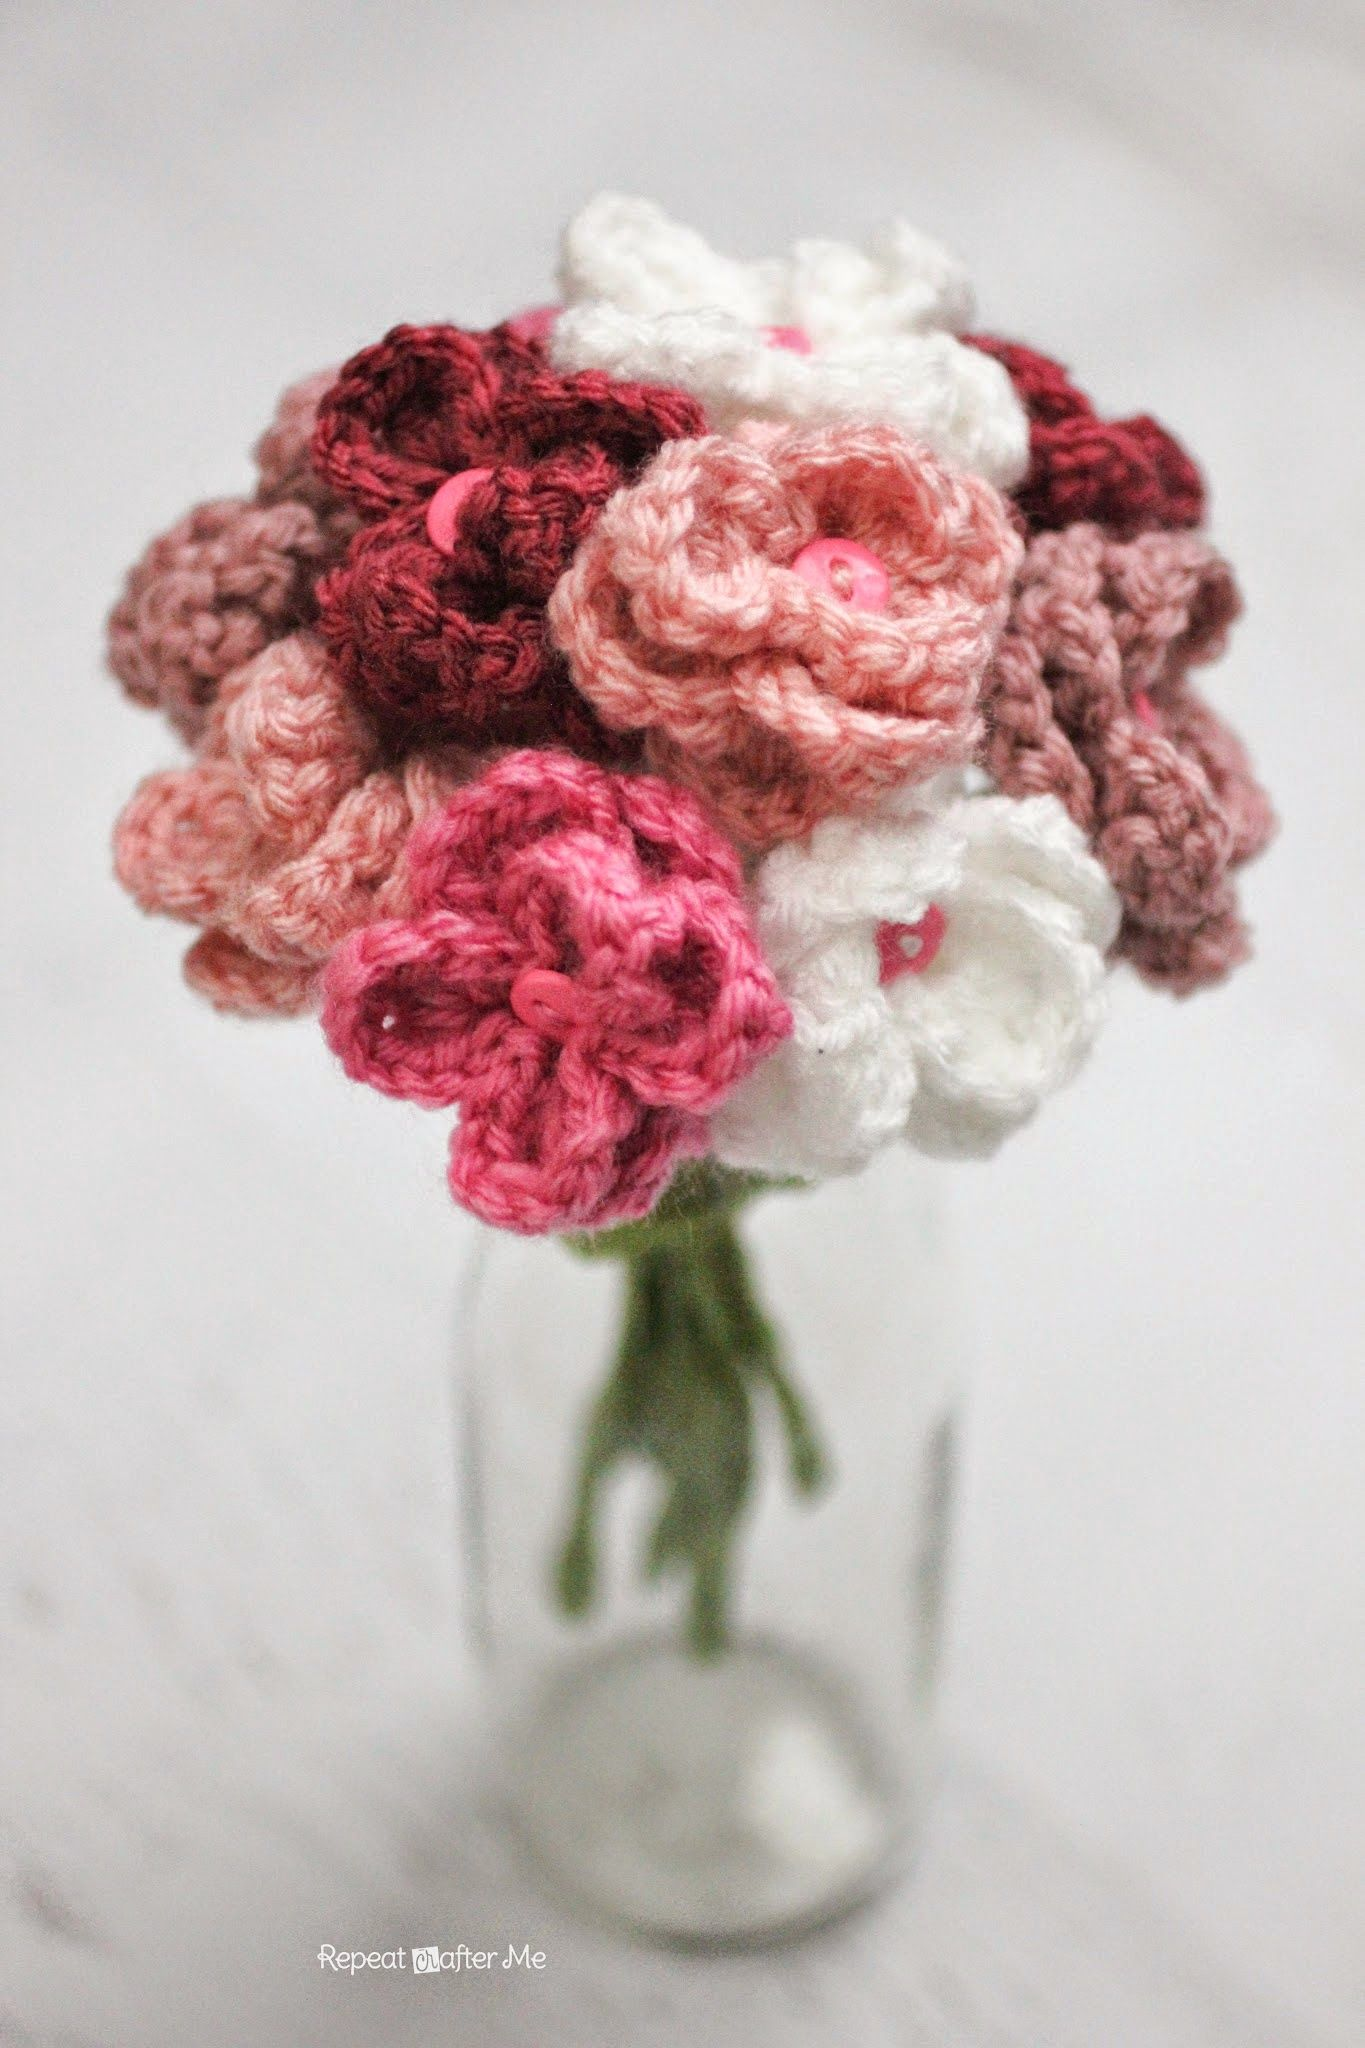 Crochet flower bouquet pinterest crochet flowers flower repeat crafter me crochet flower bouquet izmirmasajfo